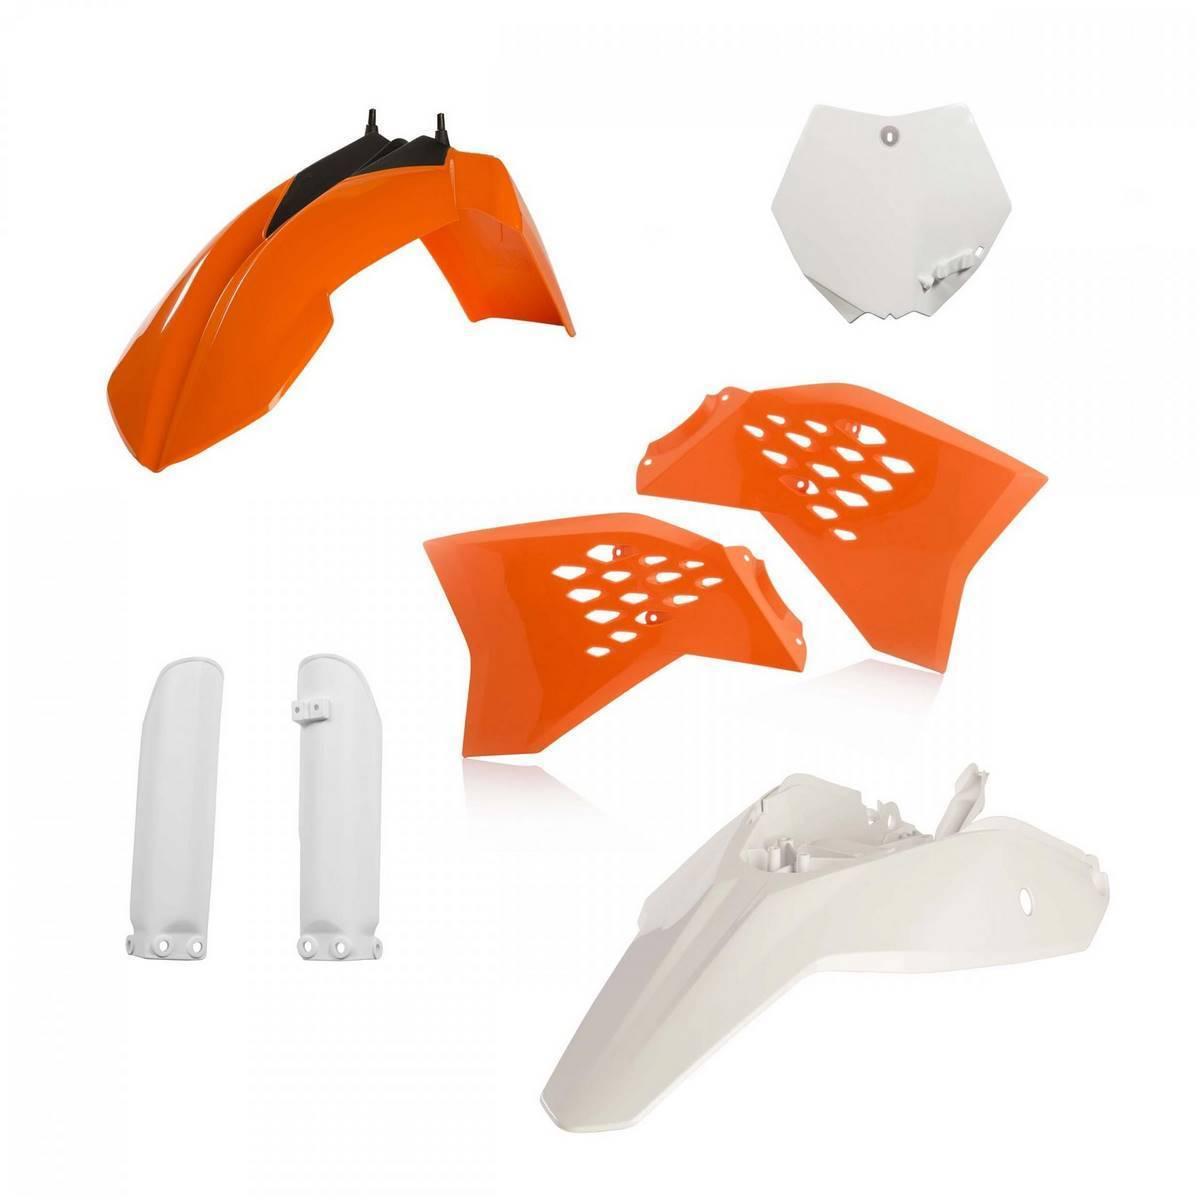 0016373-553 - Full Kit Plasticos Sx 65 09 11 Origen